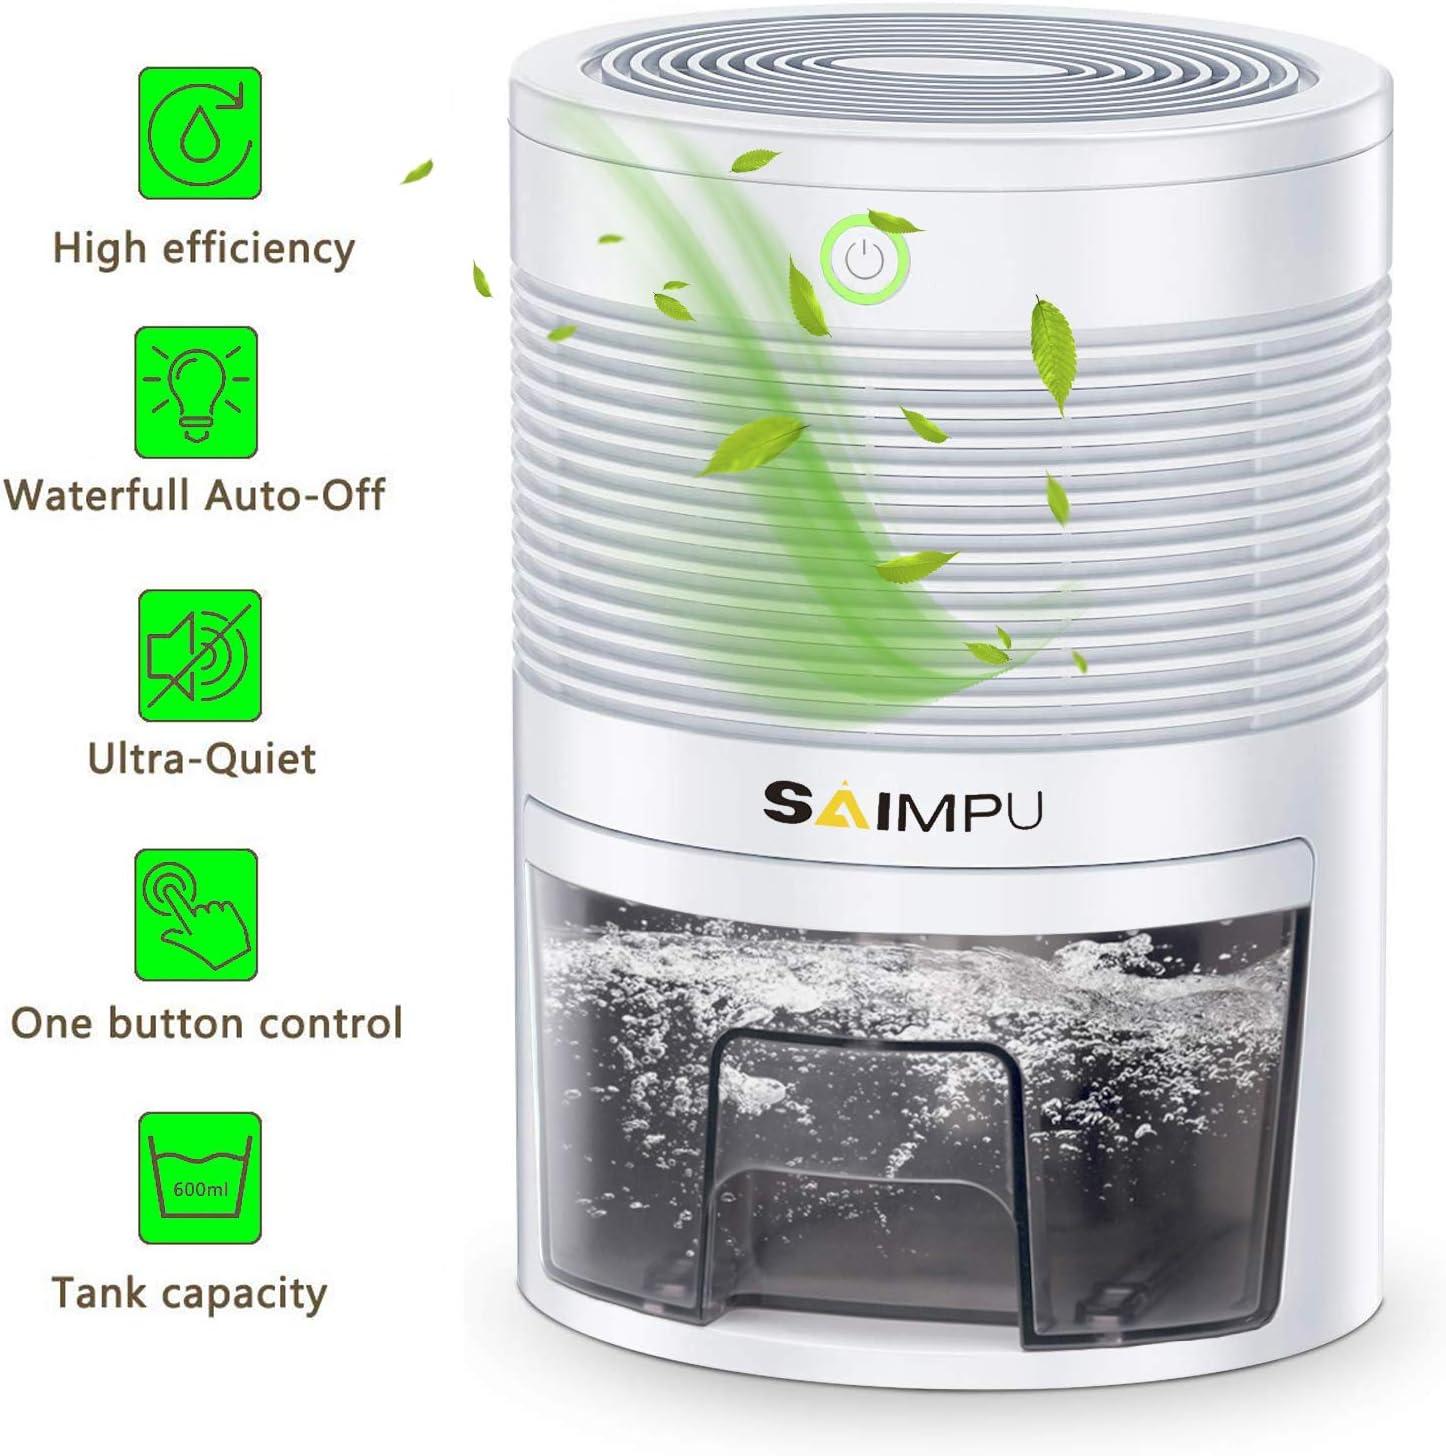 Mini Dehumidifier Ultra-Quiet Portable Electric Small Dehumidifier, 2200 Cubic Feet 220 sq ft for Bedroom, Bathroom, RV, Closet